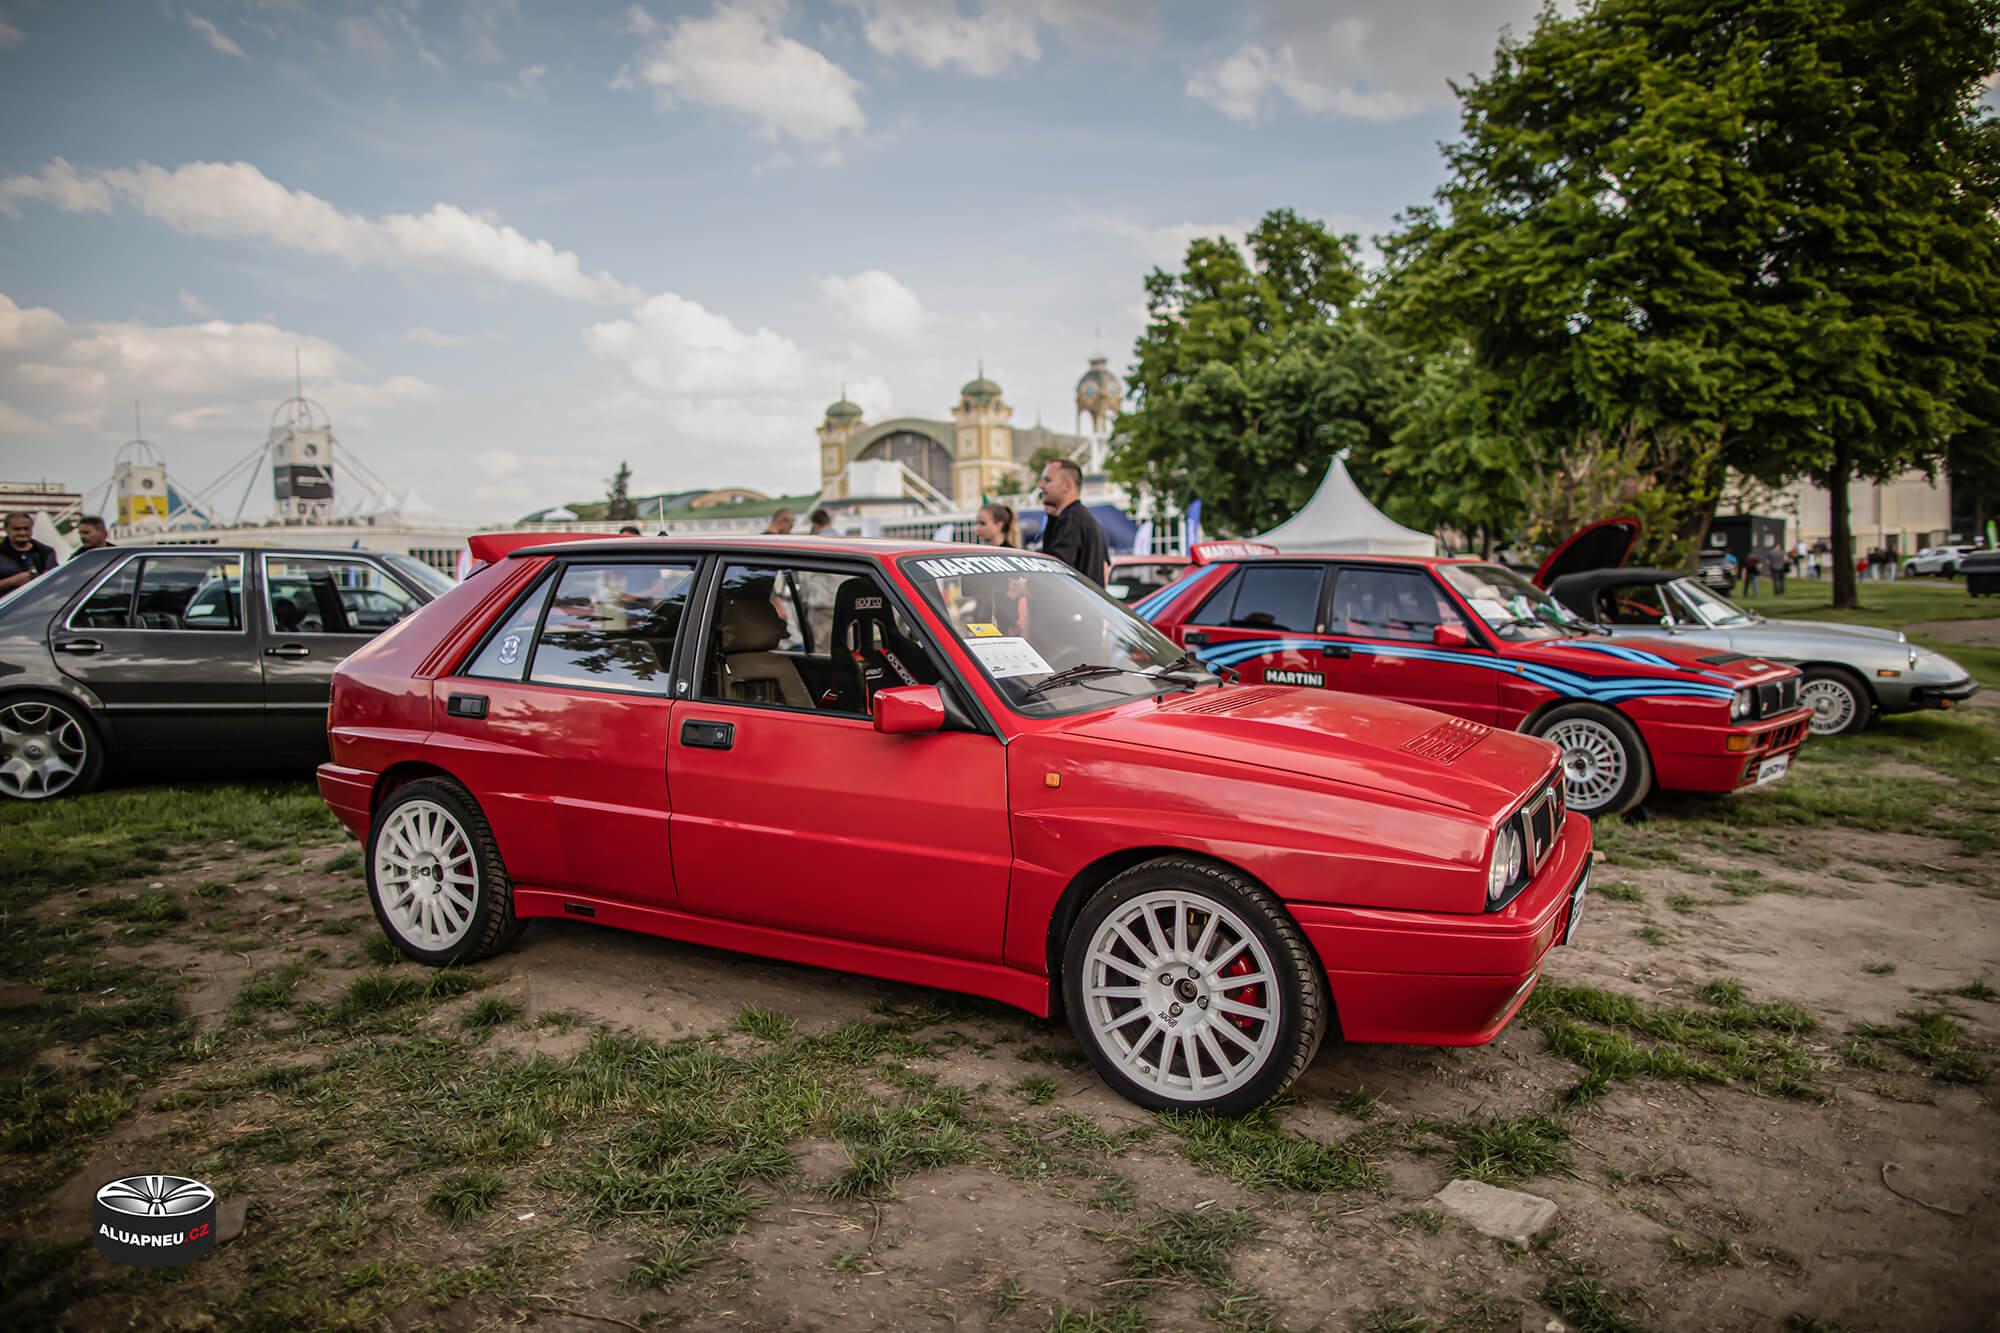 Alu kola Lancia Delta Hf Integrale Evo - Youngtimer - www.aluapneu.cz